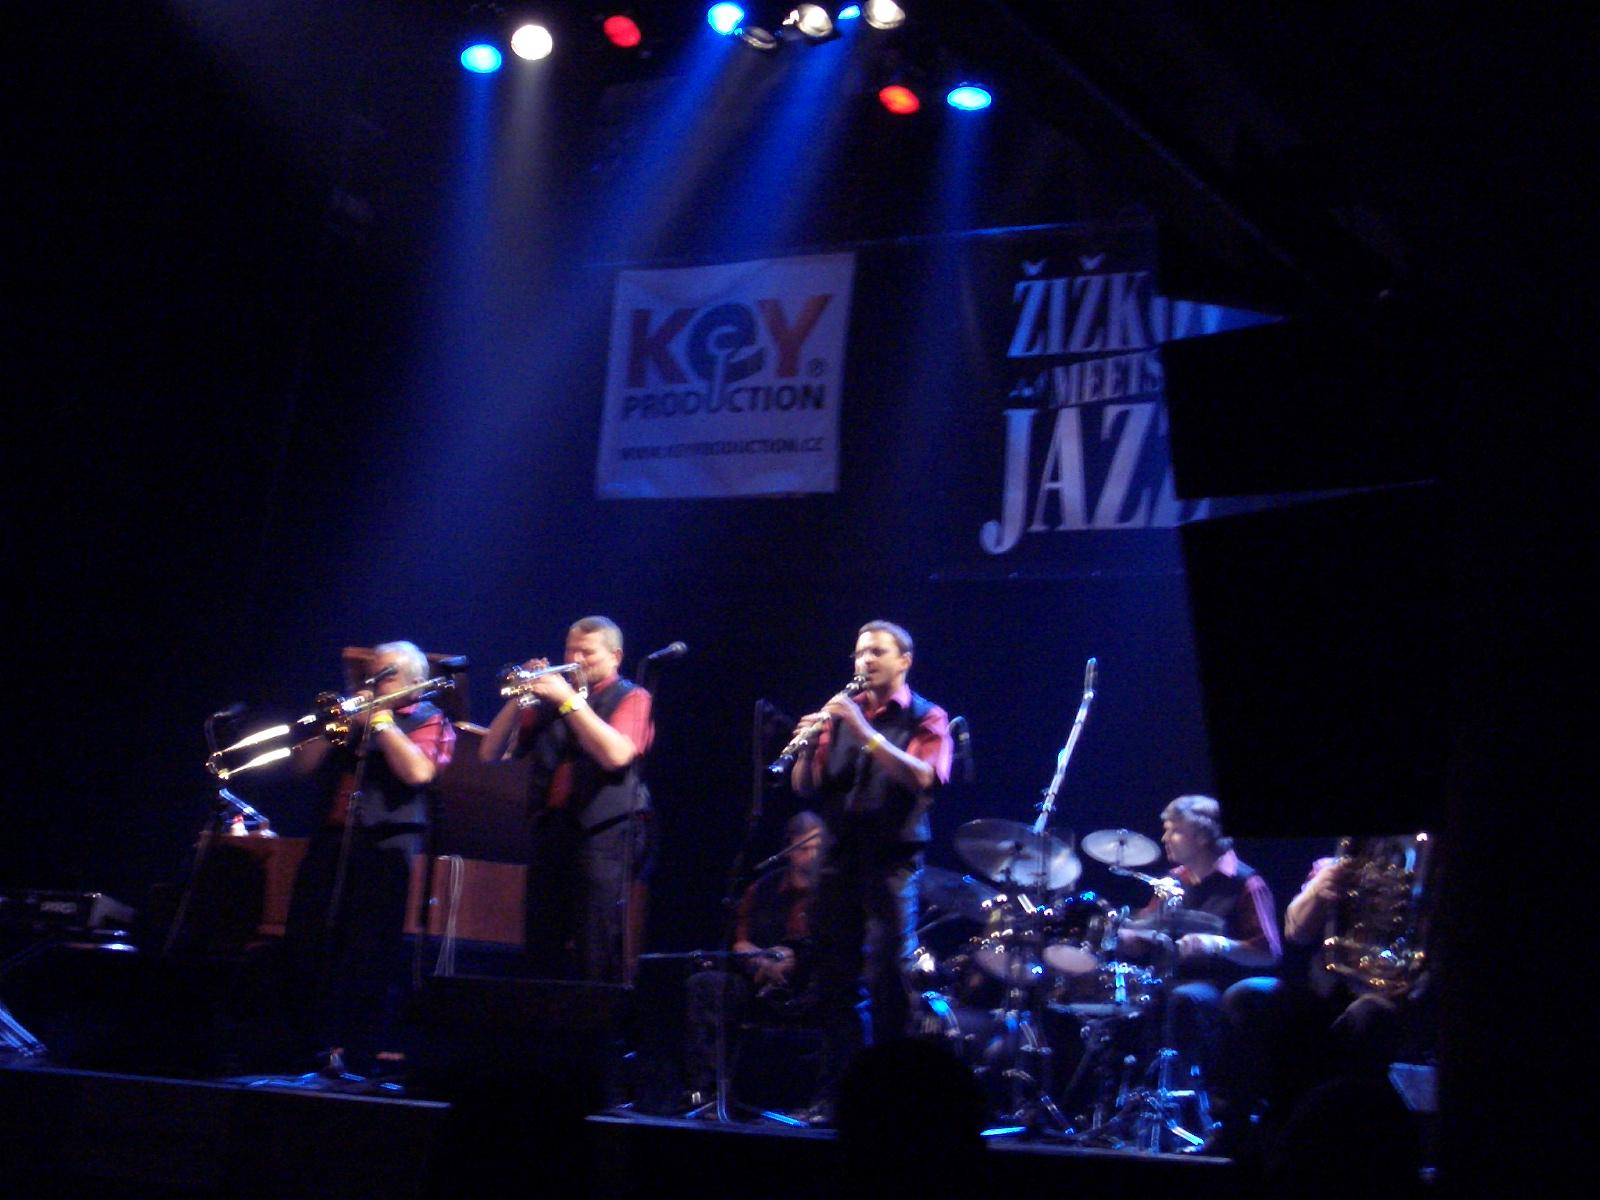 Žižkov Meets Jazz